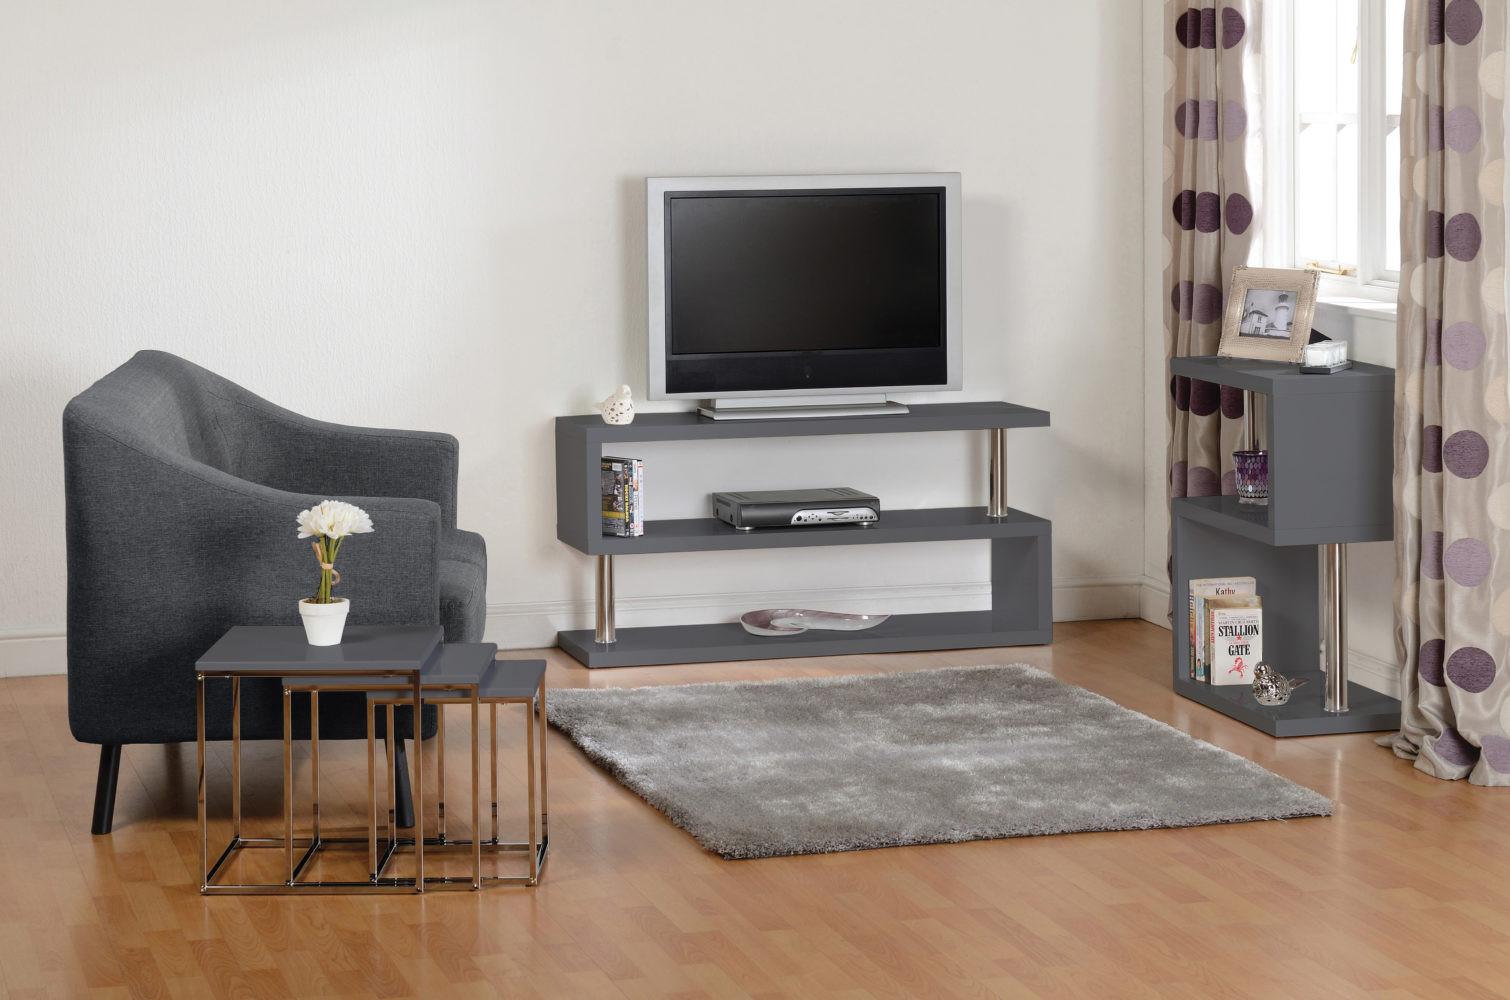 CHARISMA-NEST-TV-3-SHELF-GREY-300-303-02